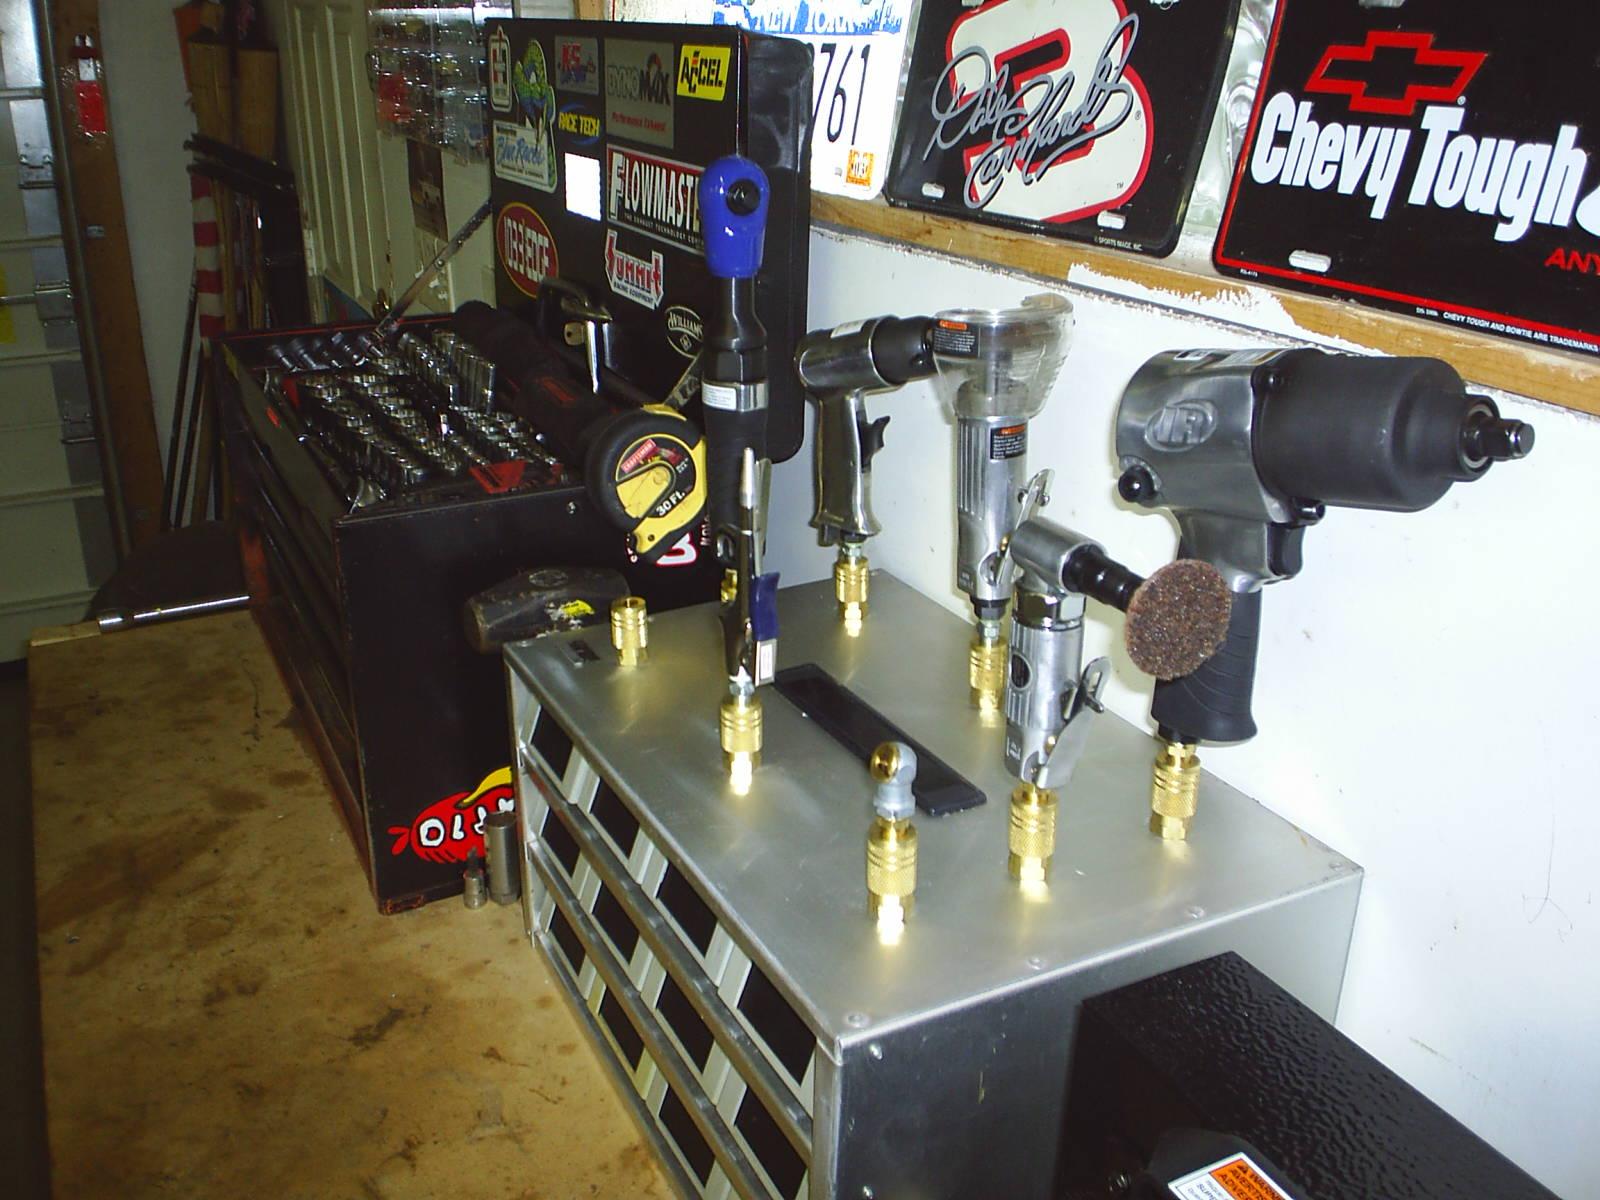 Click image for larger version  Name:Garage photos 005.jpg Views:932 Size:225.4 KB ID:8063